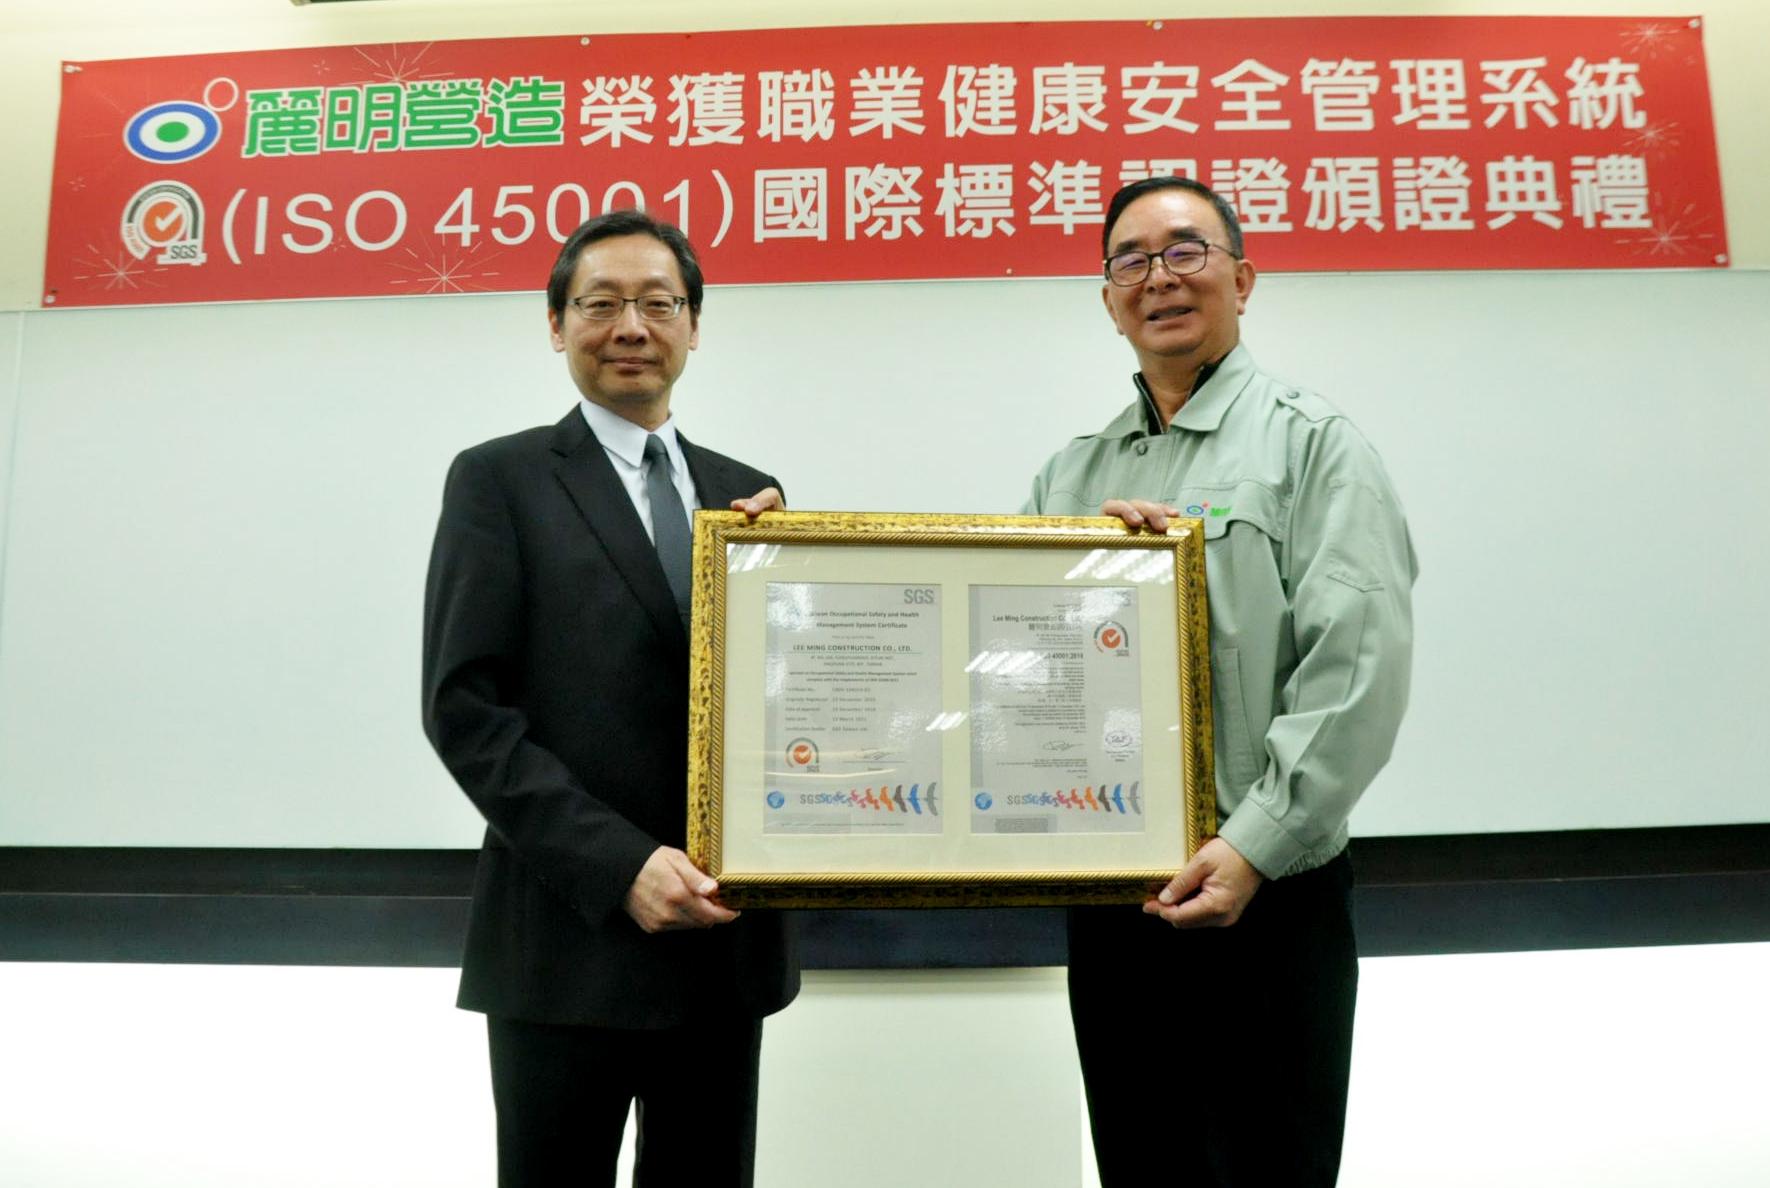 ISO 45001 授證典禮